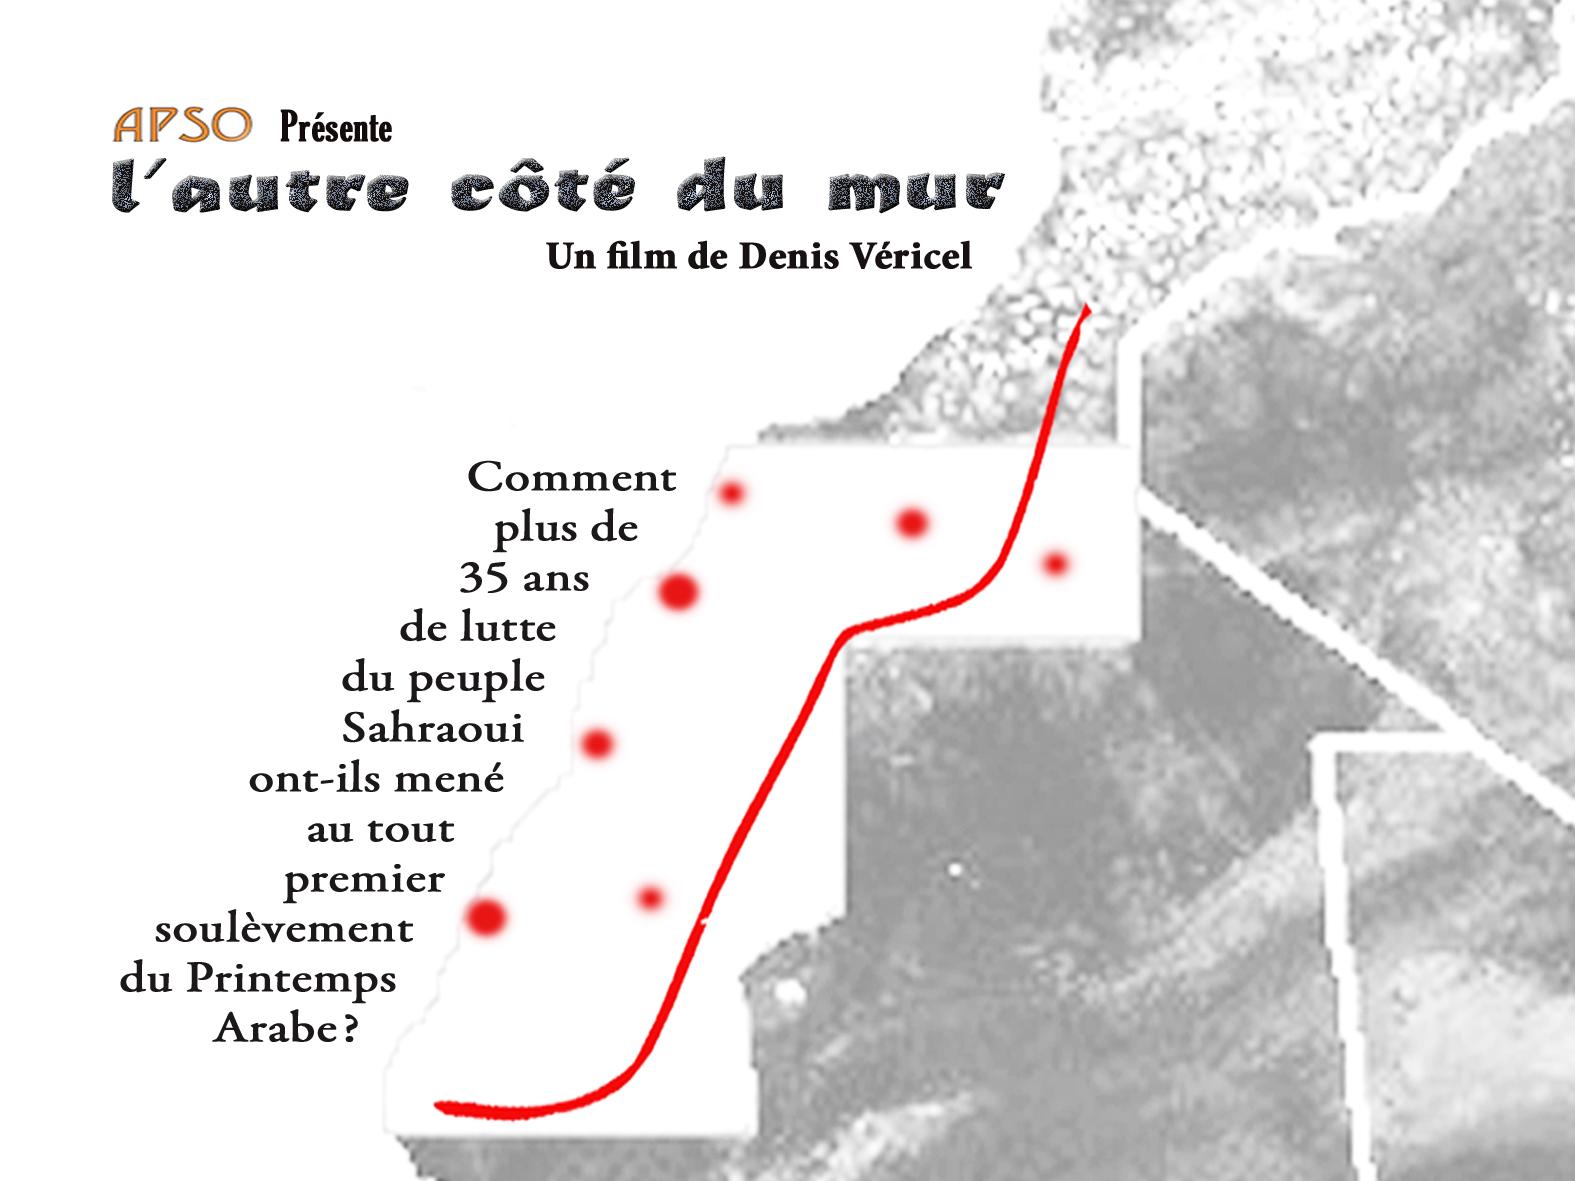 http://lautrecotedumur.files.wordpress.com/2011/11/image-site.jpg